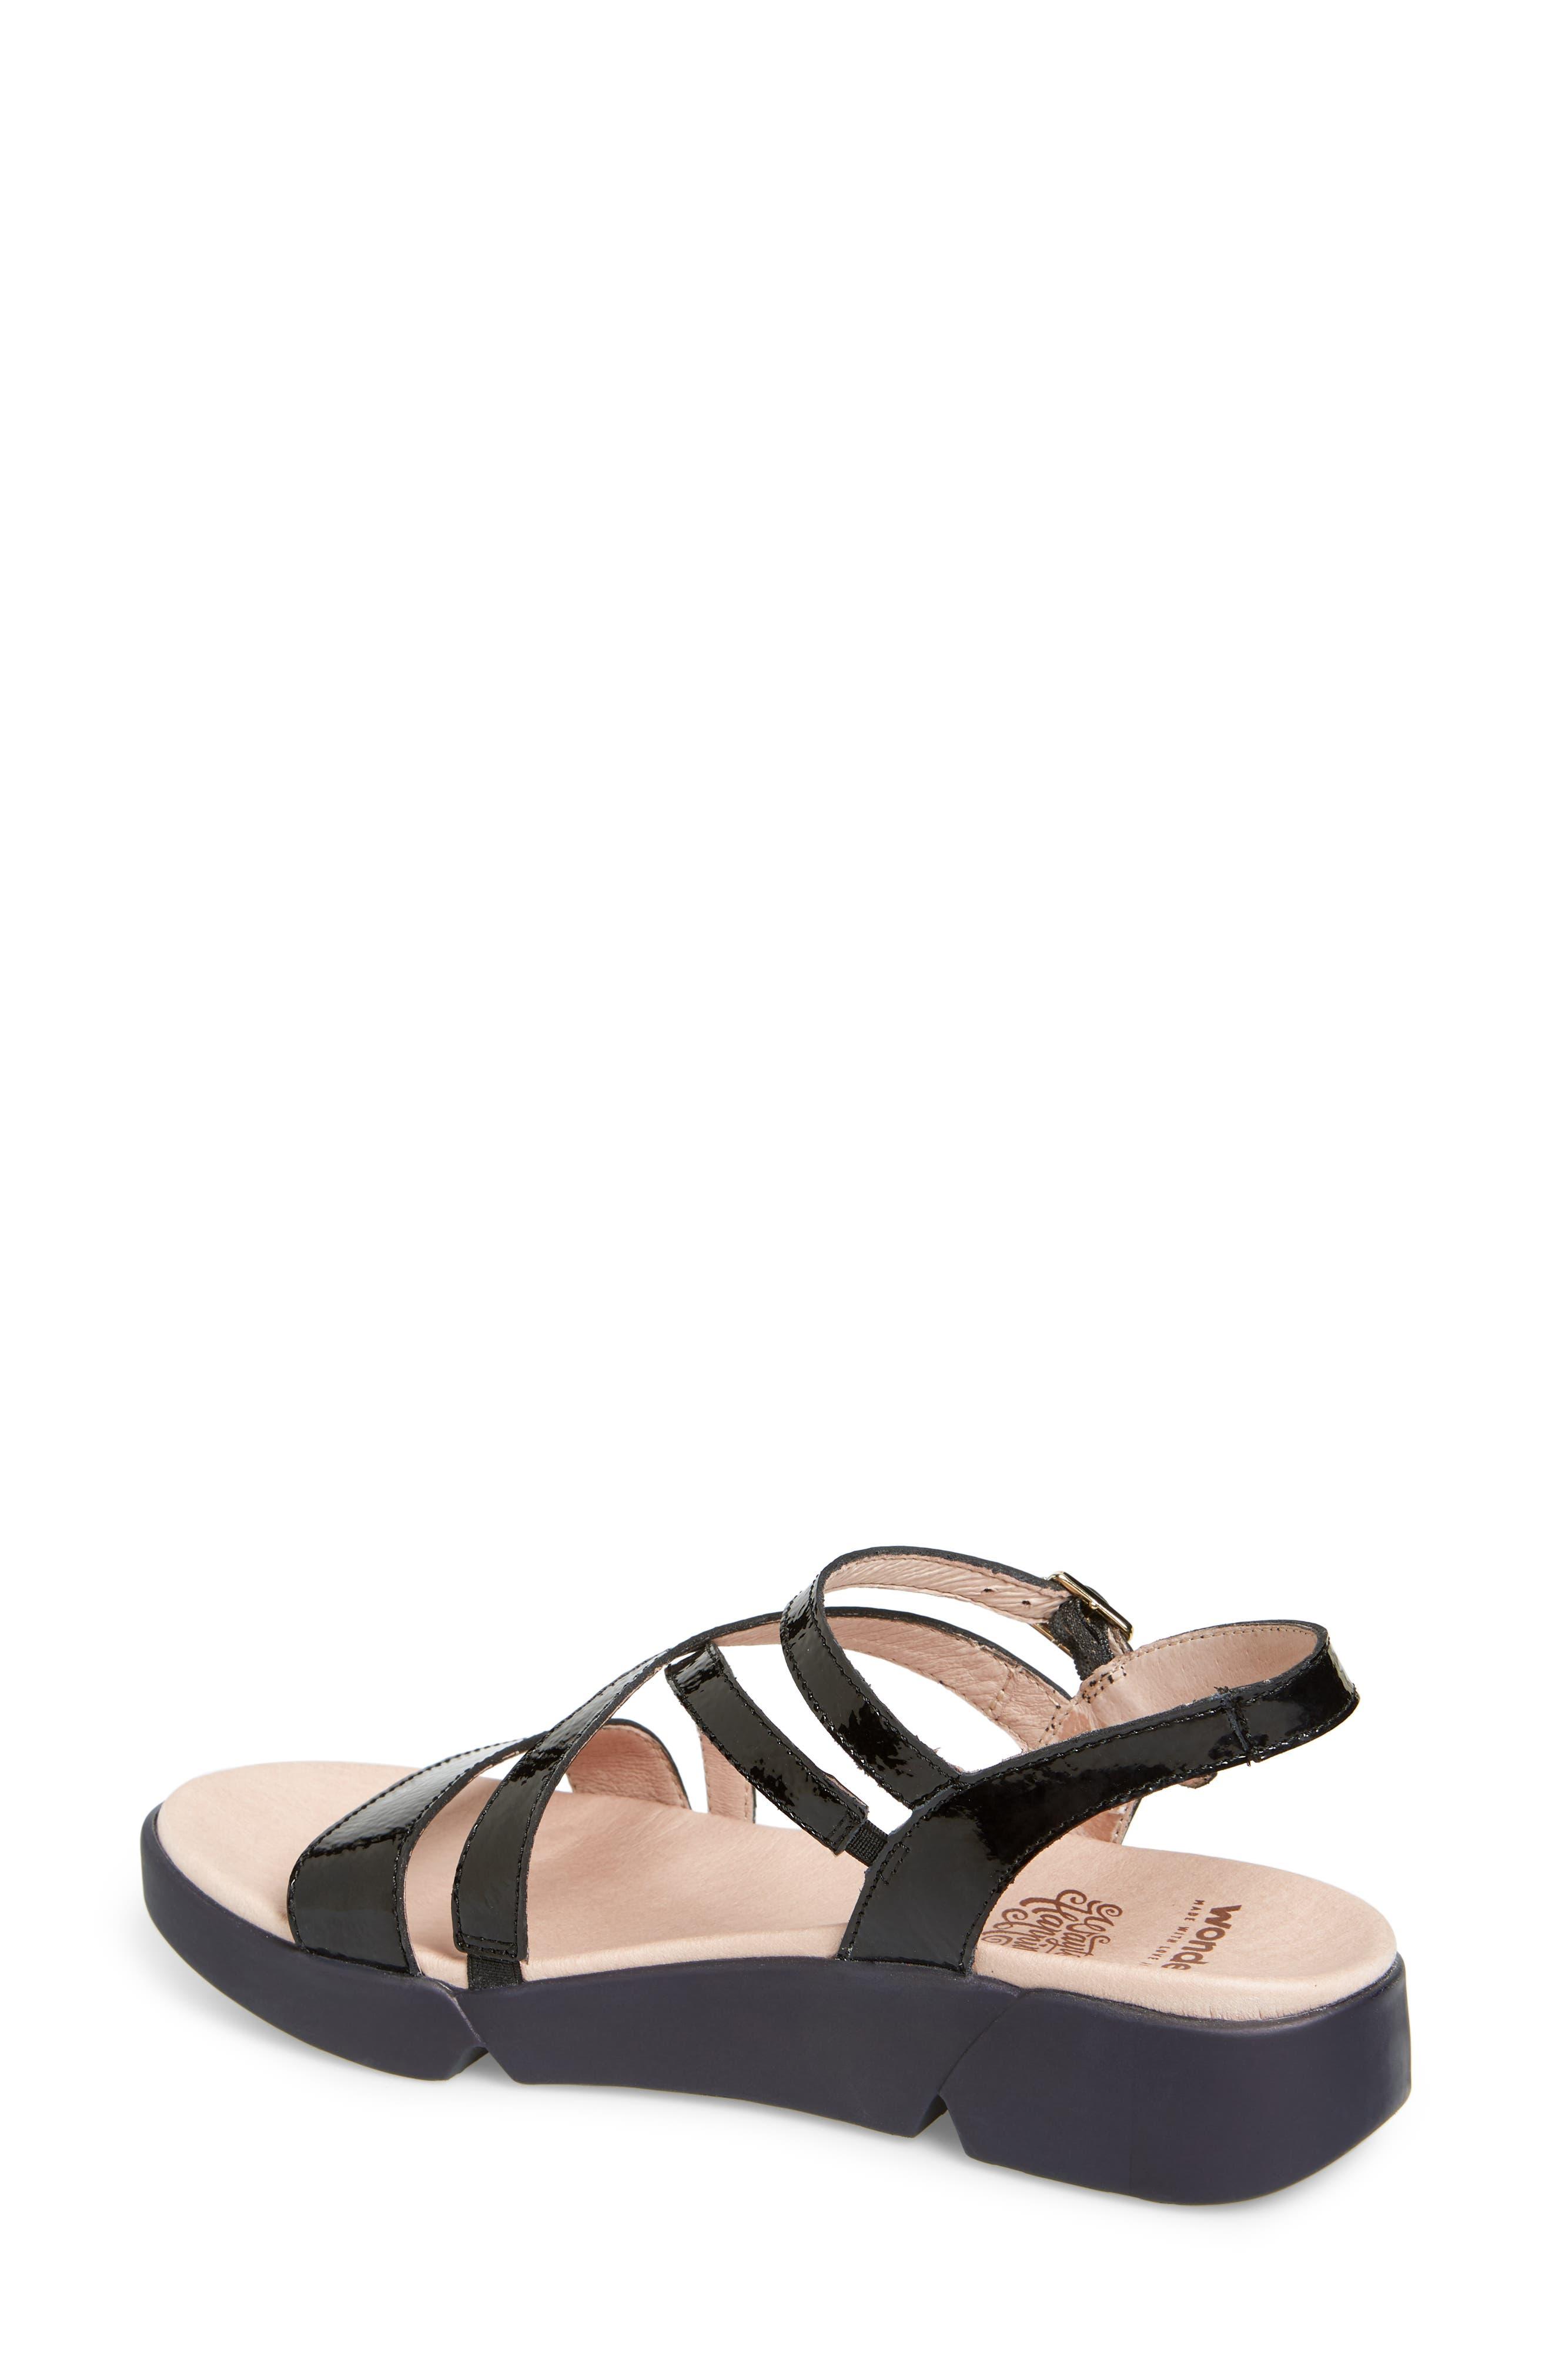 Wedge Sandal,                             Alternate thumbnail 2, color,                             BLACK PATENT LEATHER